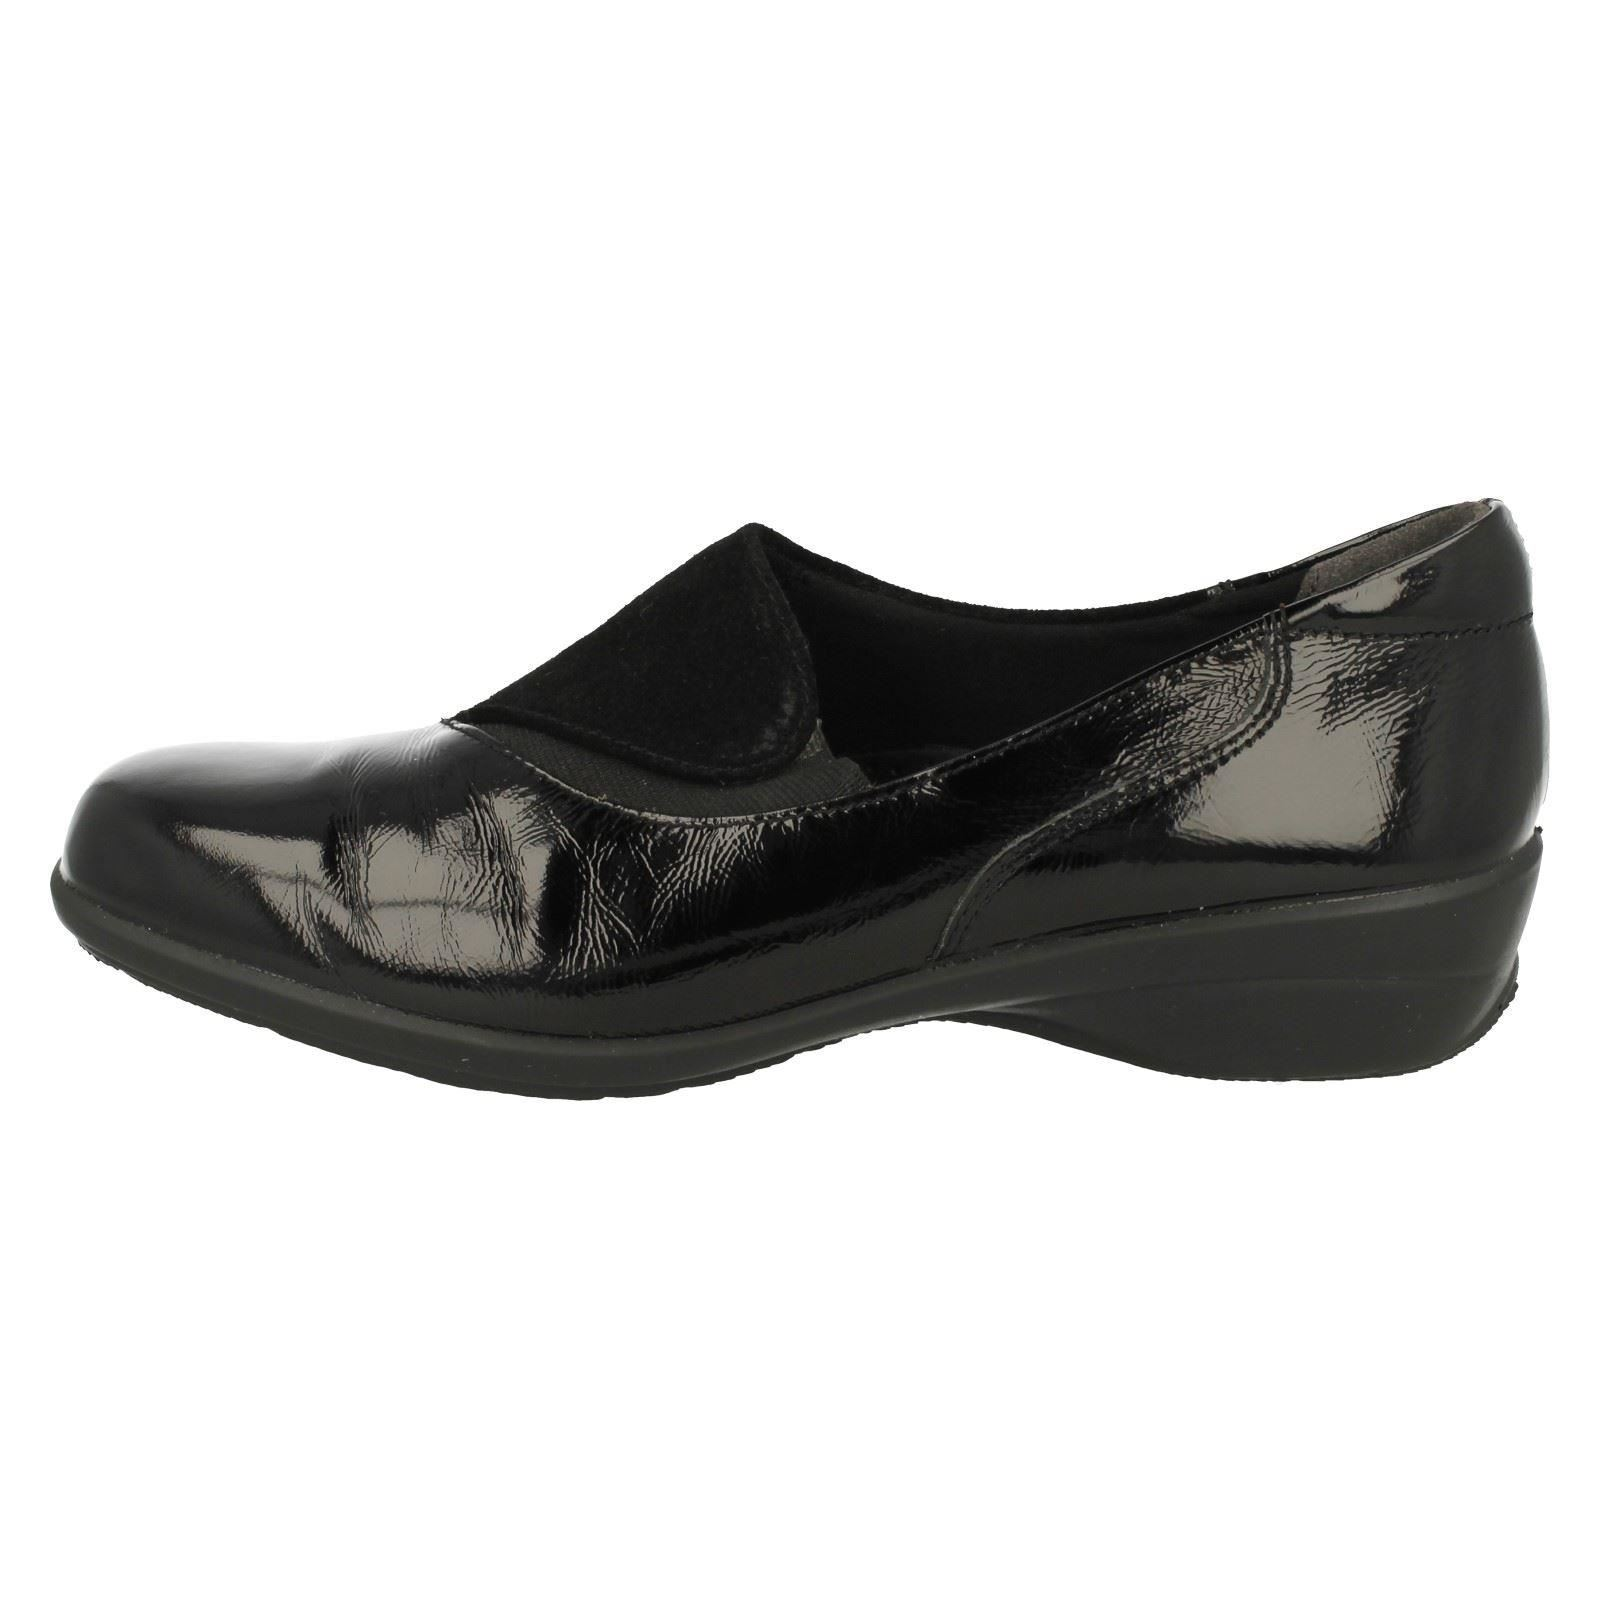 Easy B DB Swing Mujeres Sin Cordones Elegante Cuero Negro Negro Negro Plano Ancho Pantalones acdcdc